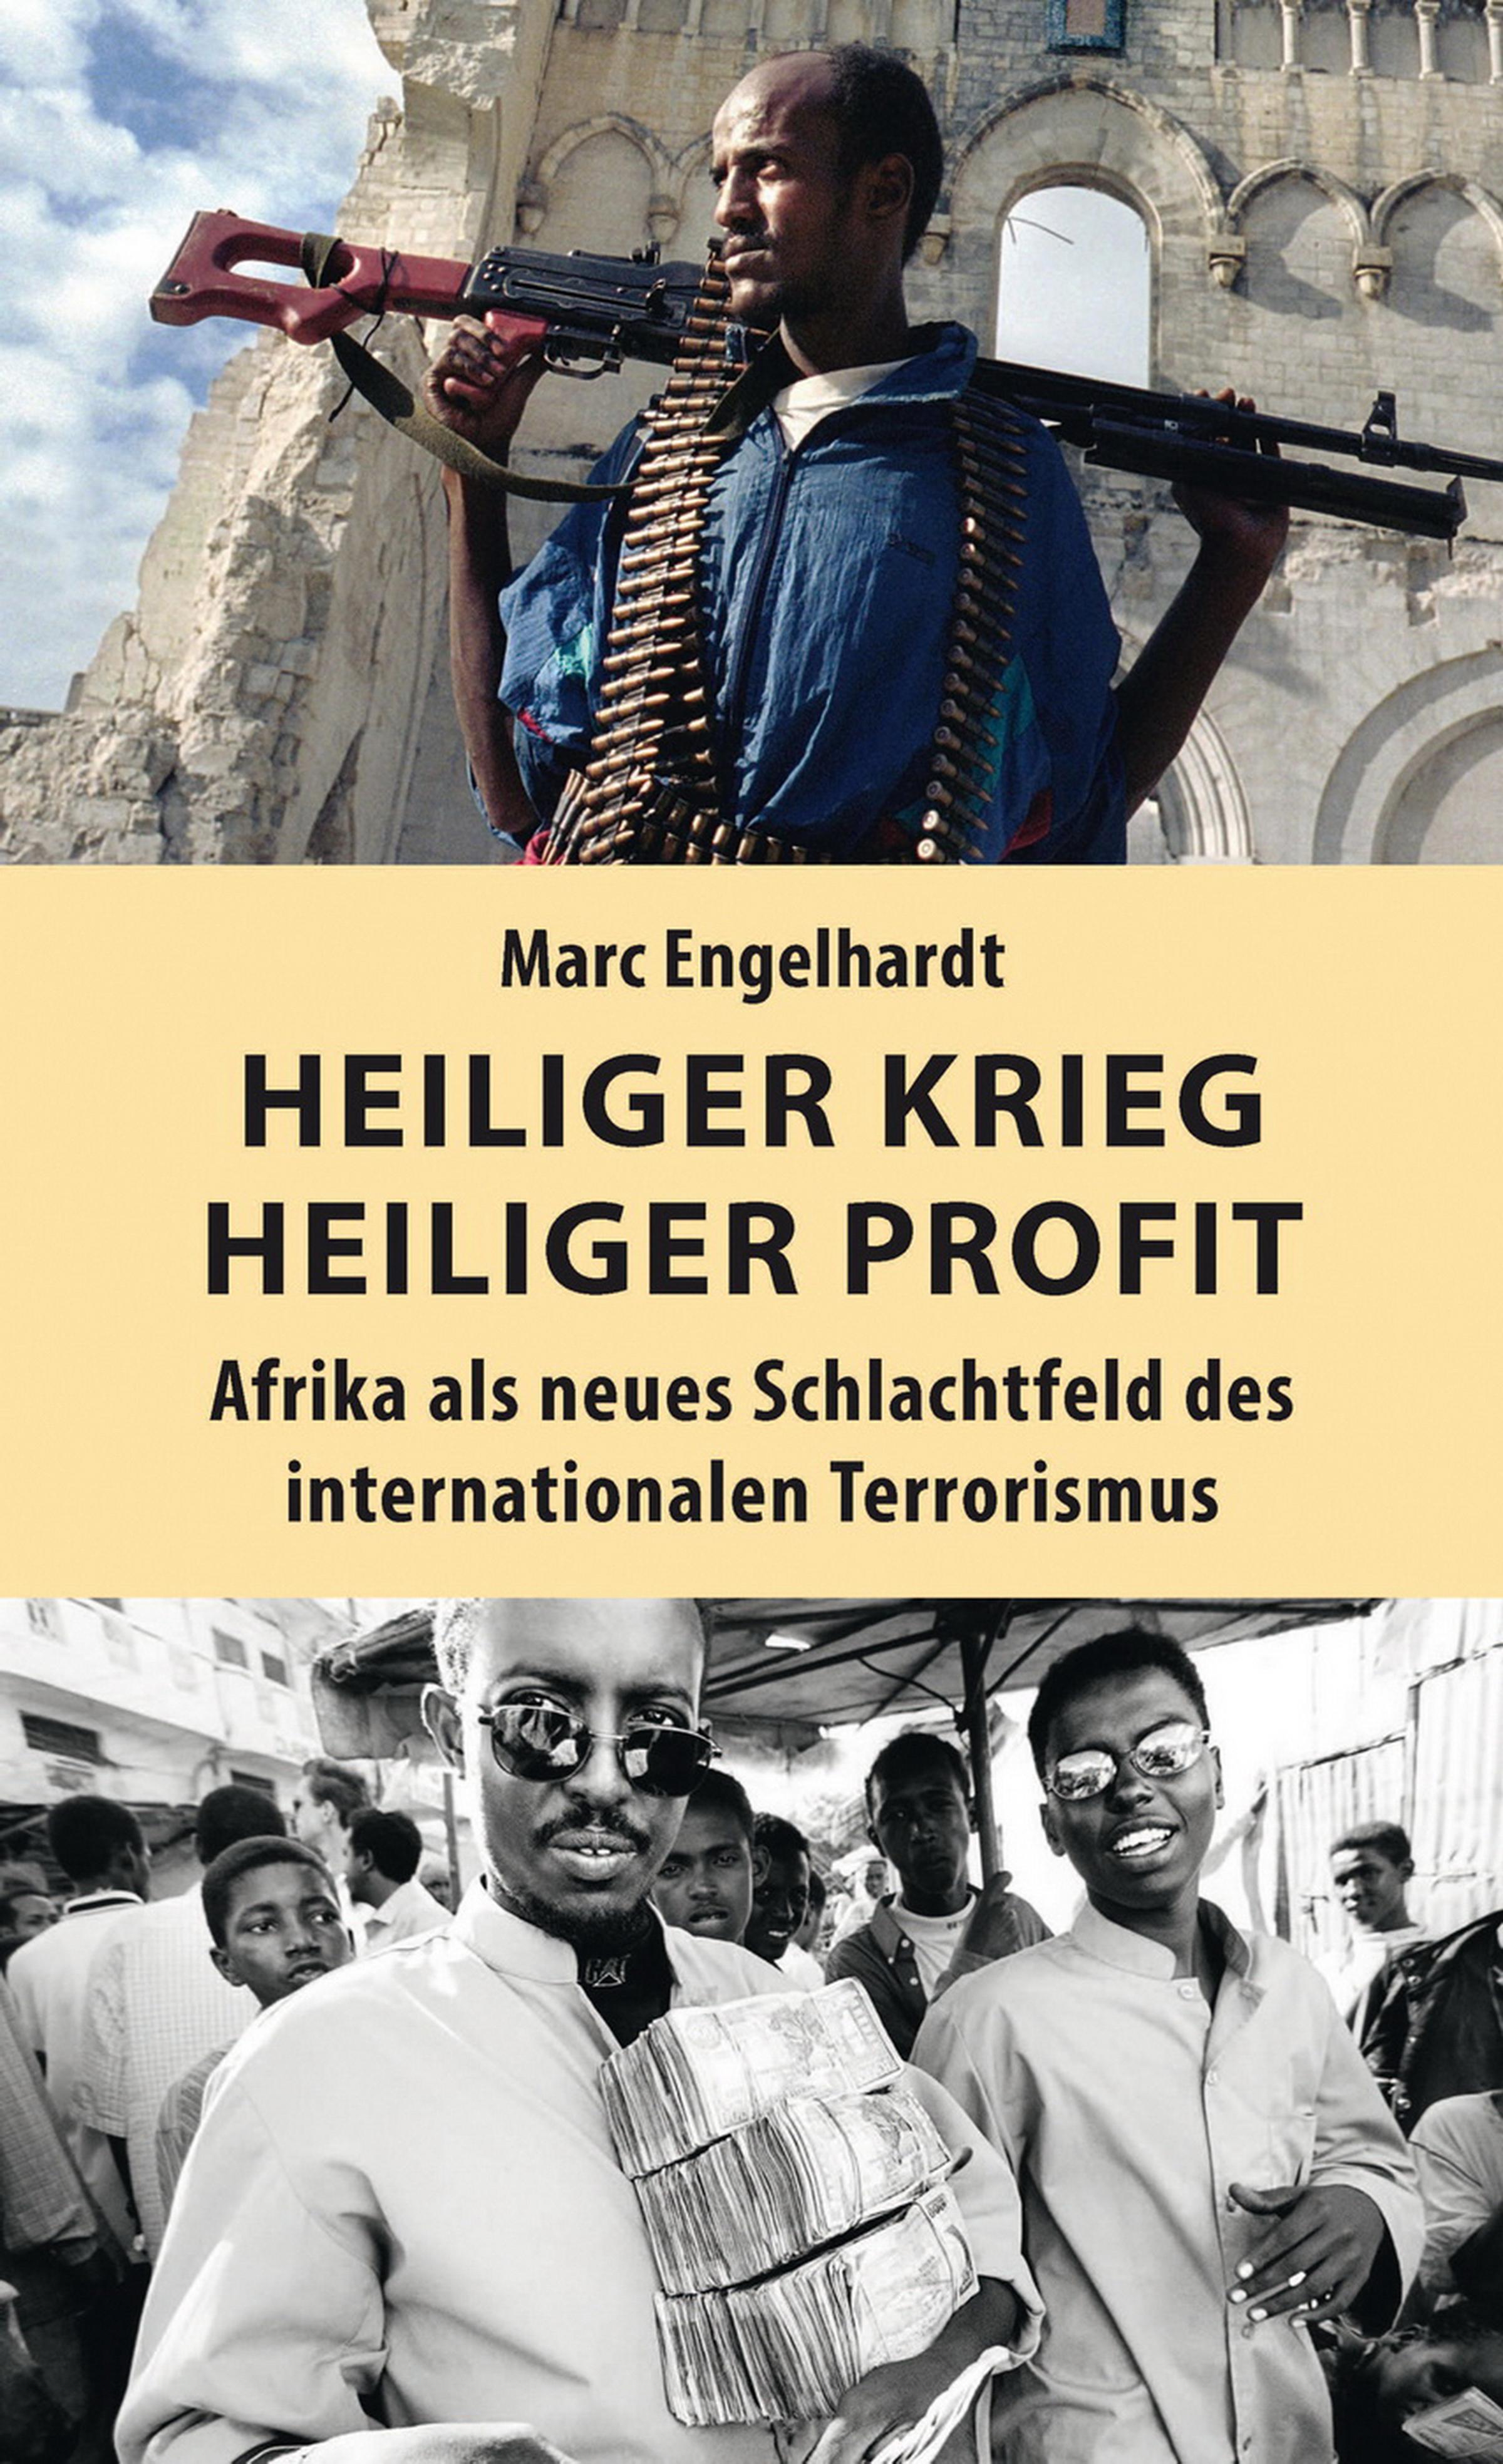 Heiliger Krieg - heiliger Profit Marc Engelhardt